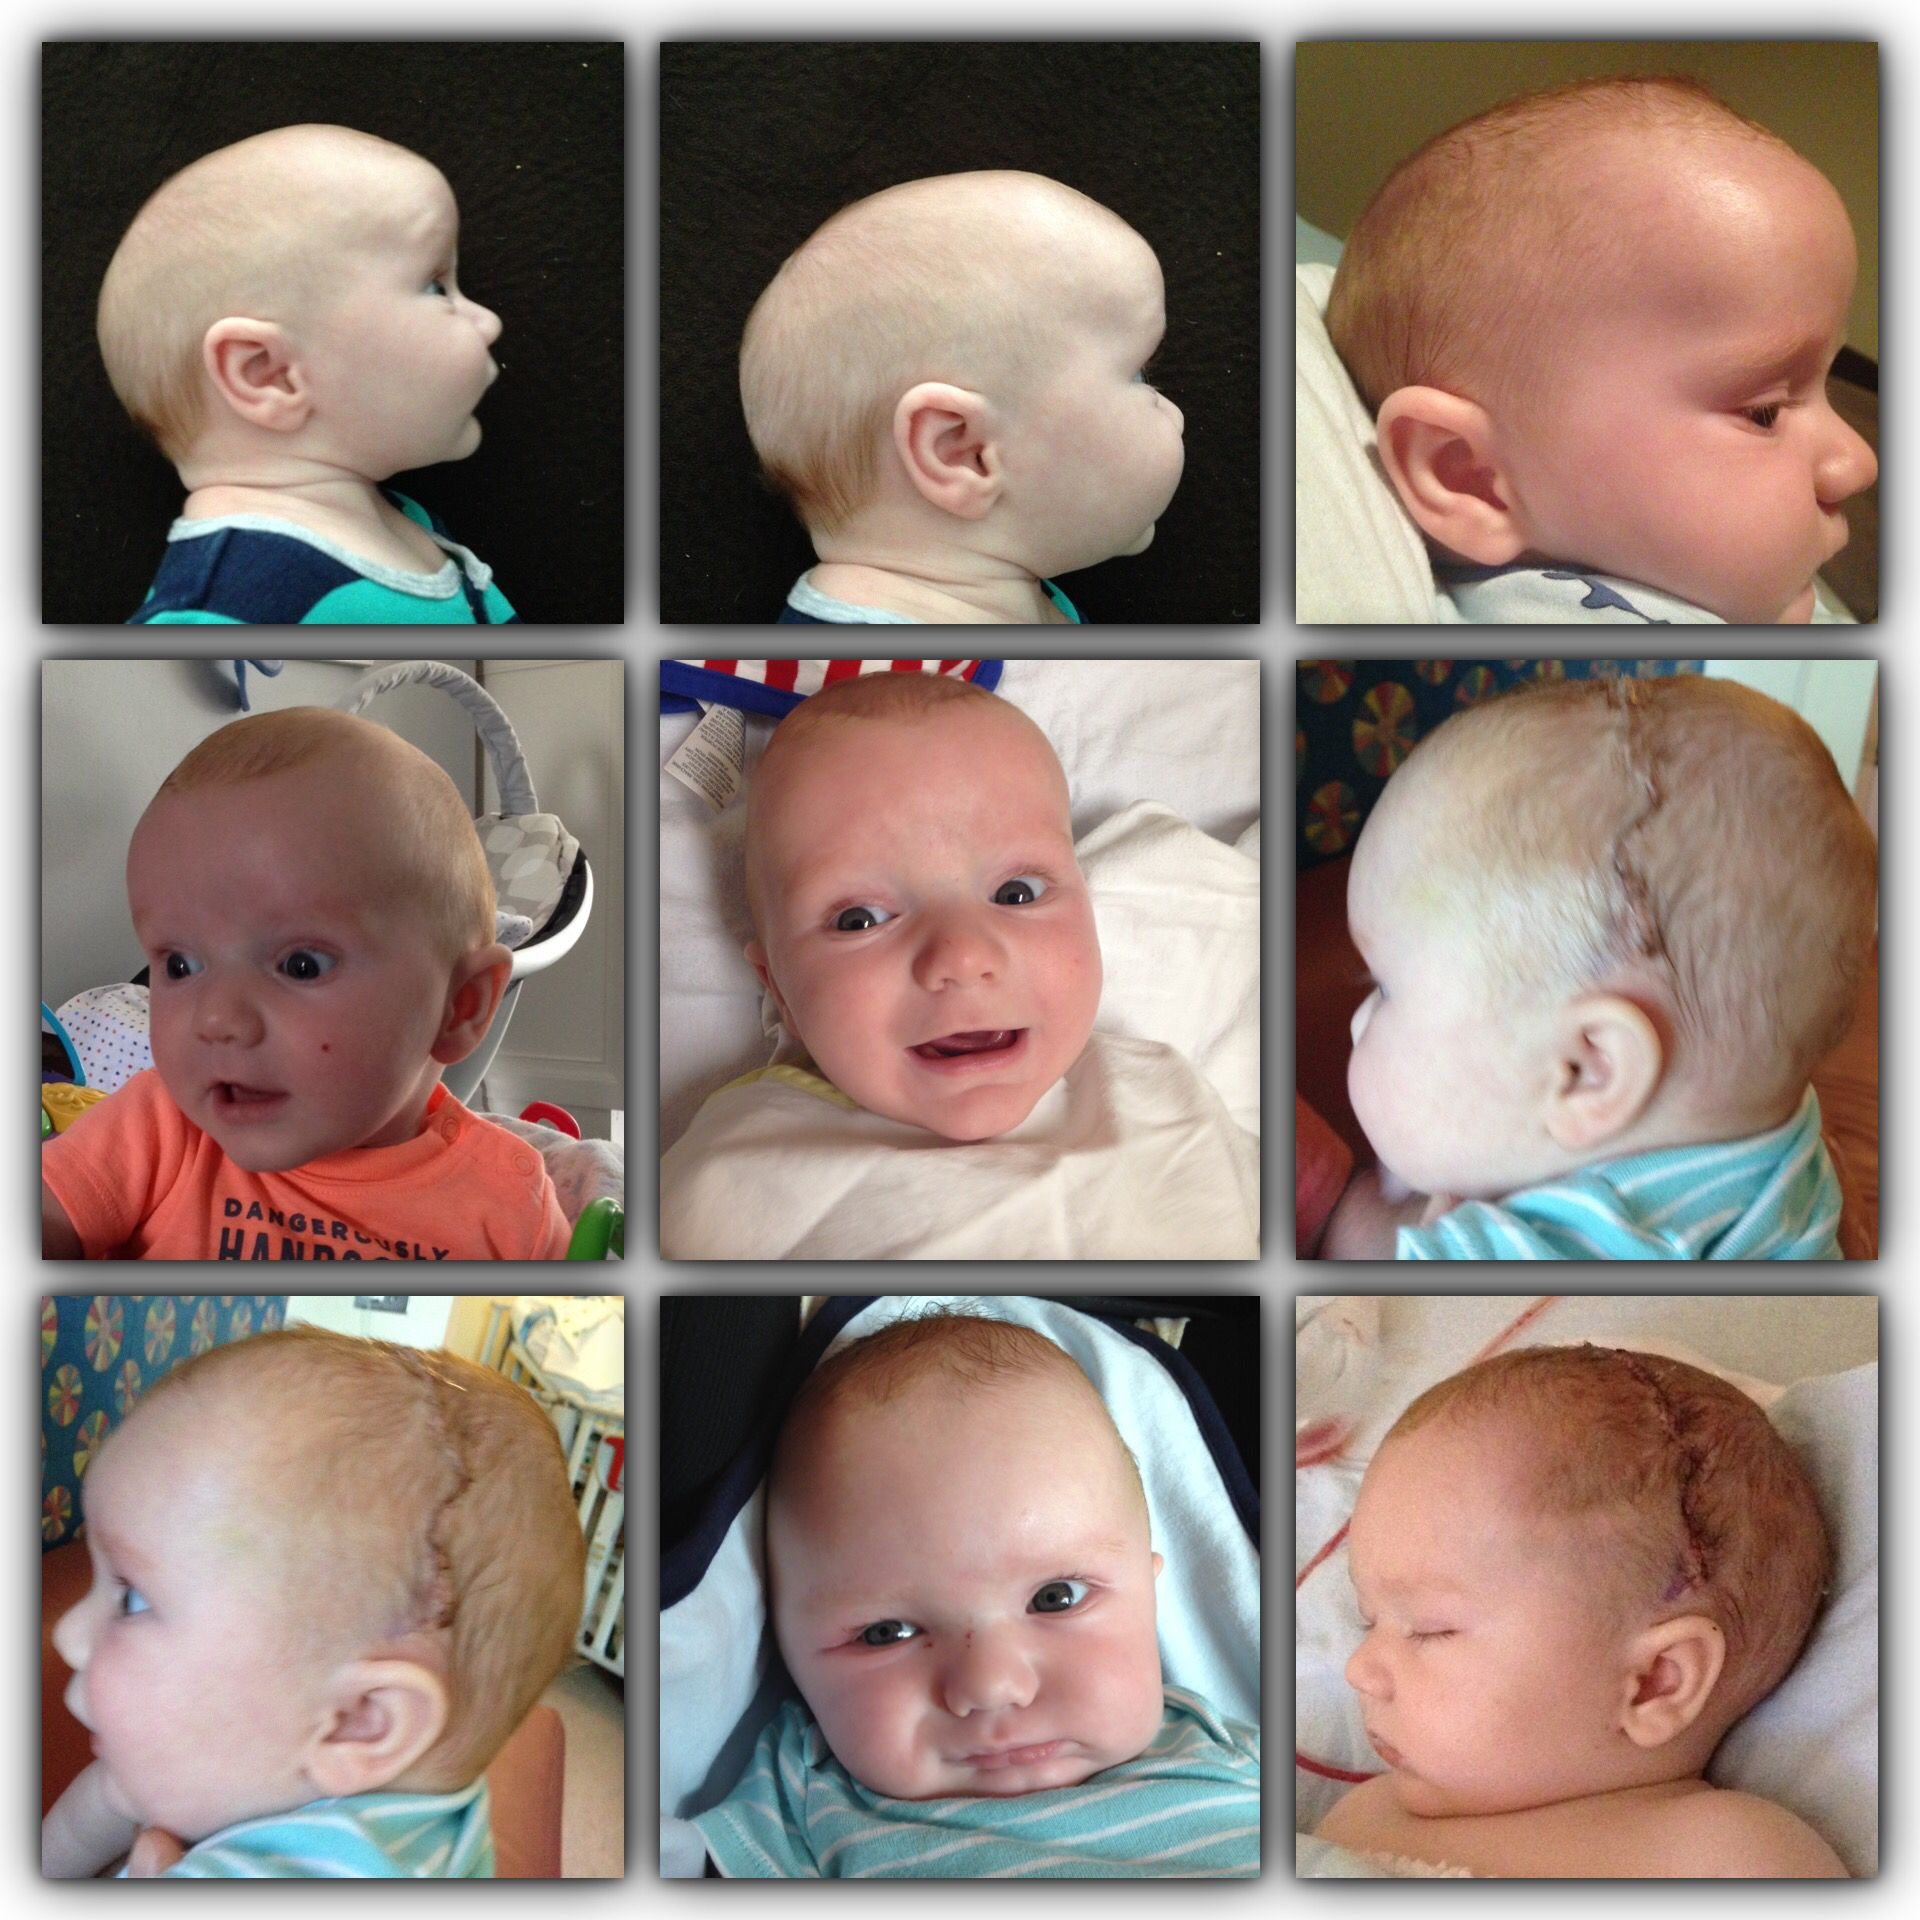 Épinglé par Jessica Siebels sur craniosynostosis | Bébé